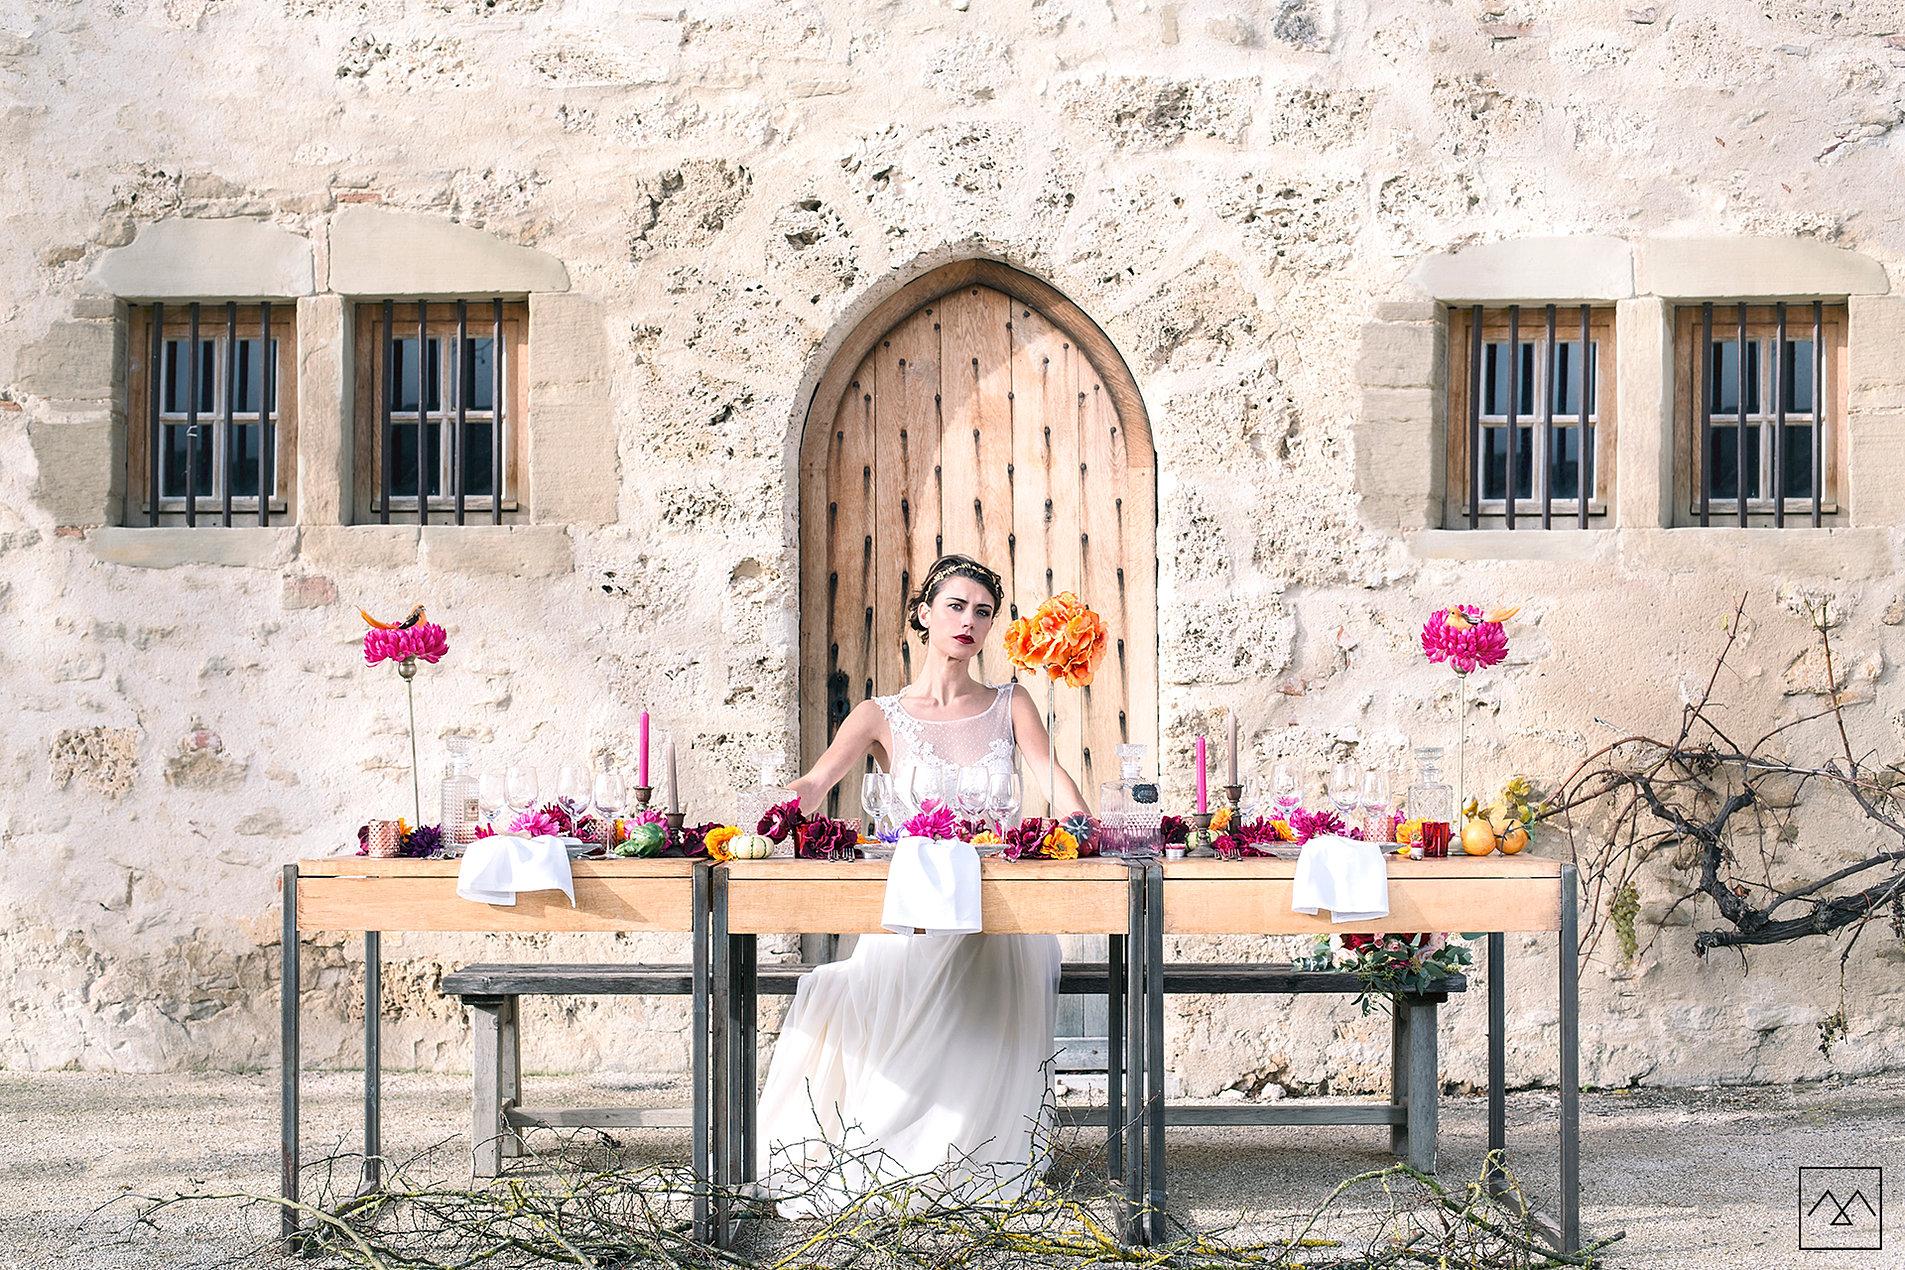 18 anna cruz maquillage et coiffure mariage lyon shooting inspiration collection 2017 - Coiffeuse Maquilleuse Mariage Lyon